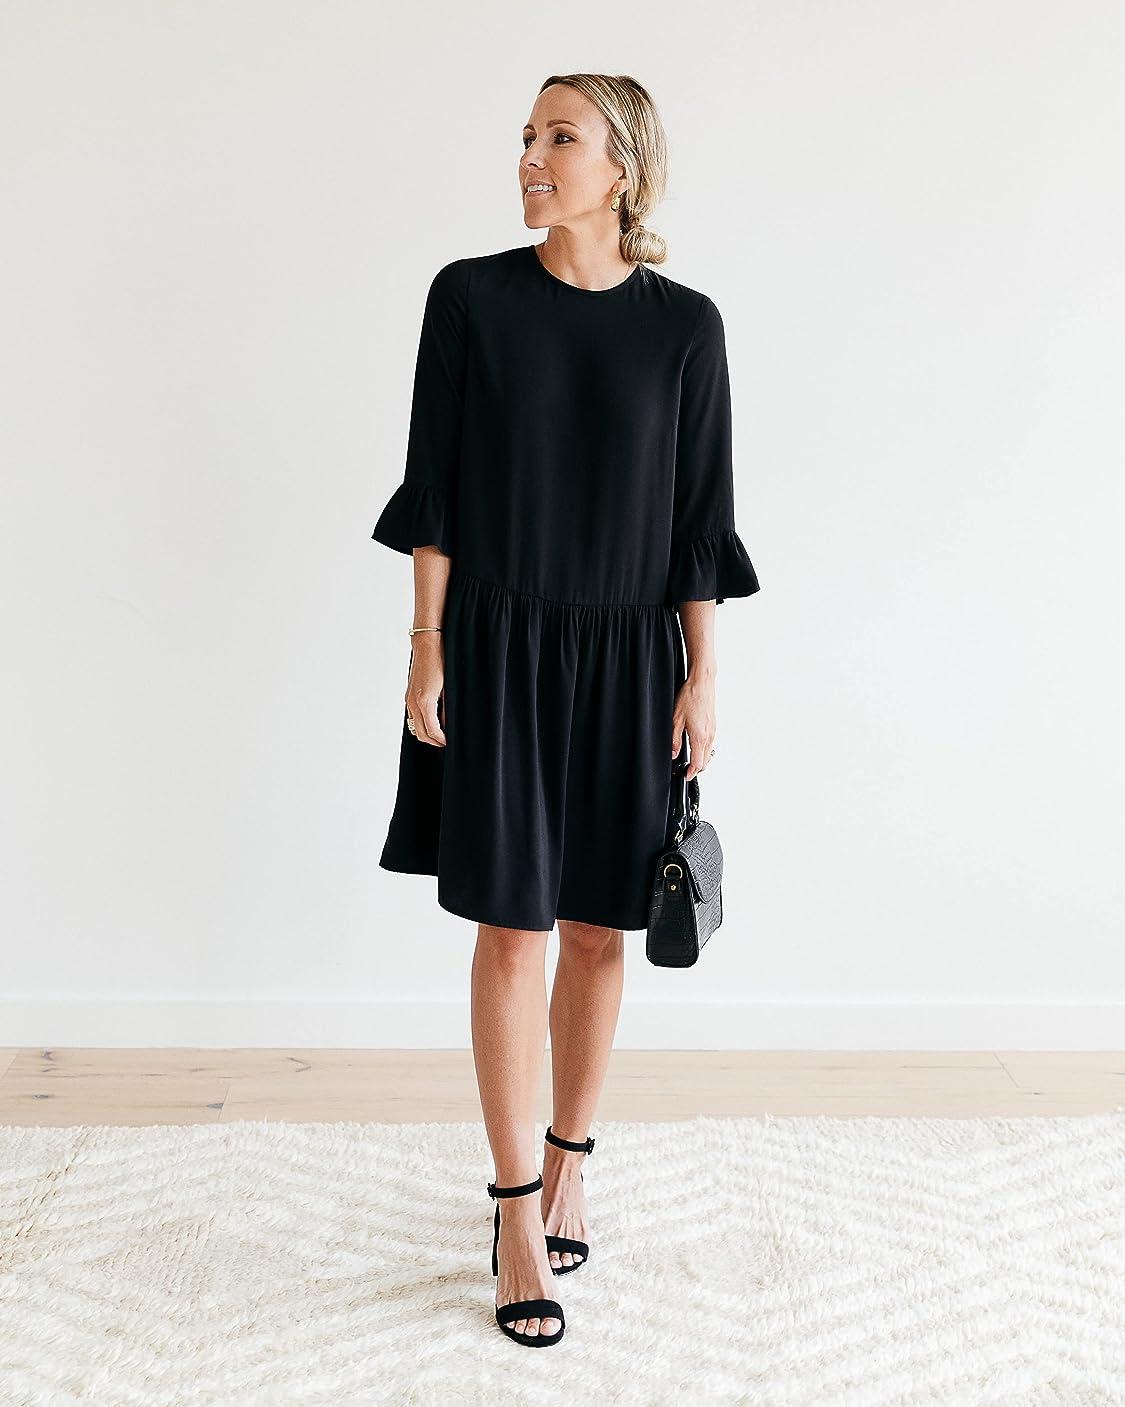 The Drop wears The Drop Women's Black Drop-Waist Dress by @jaceyduprie